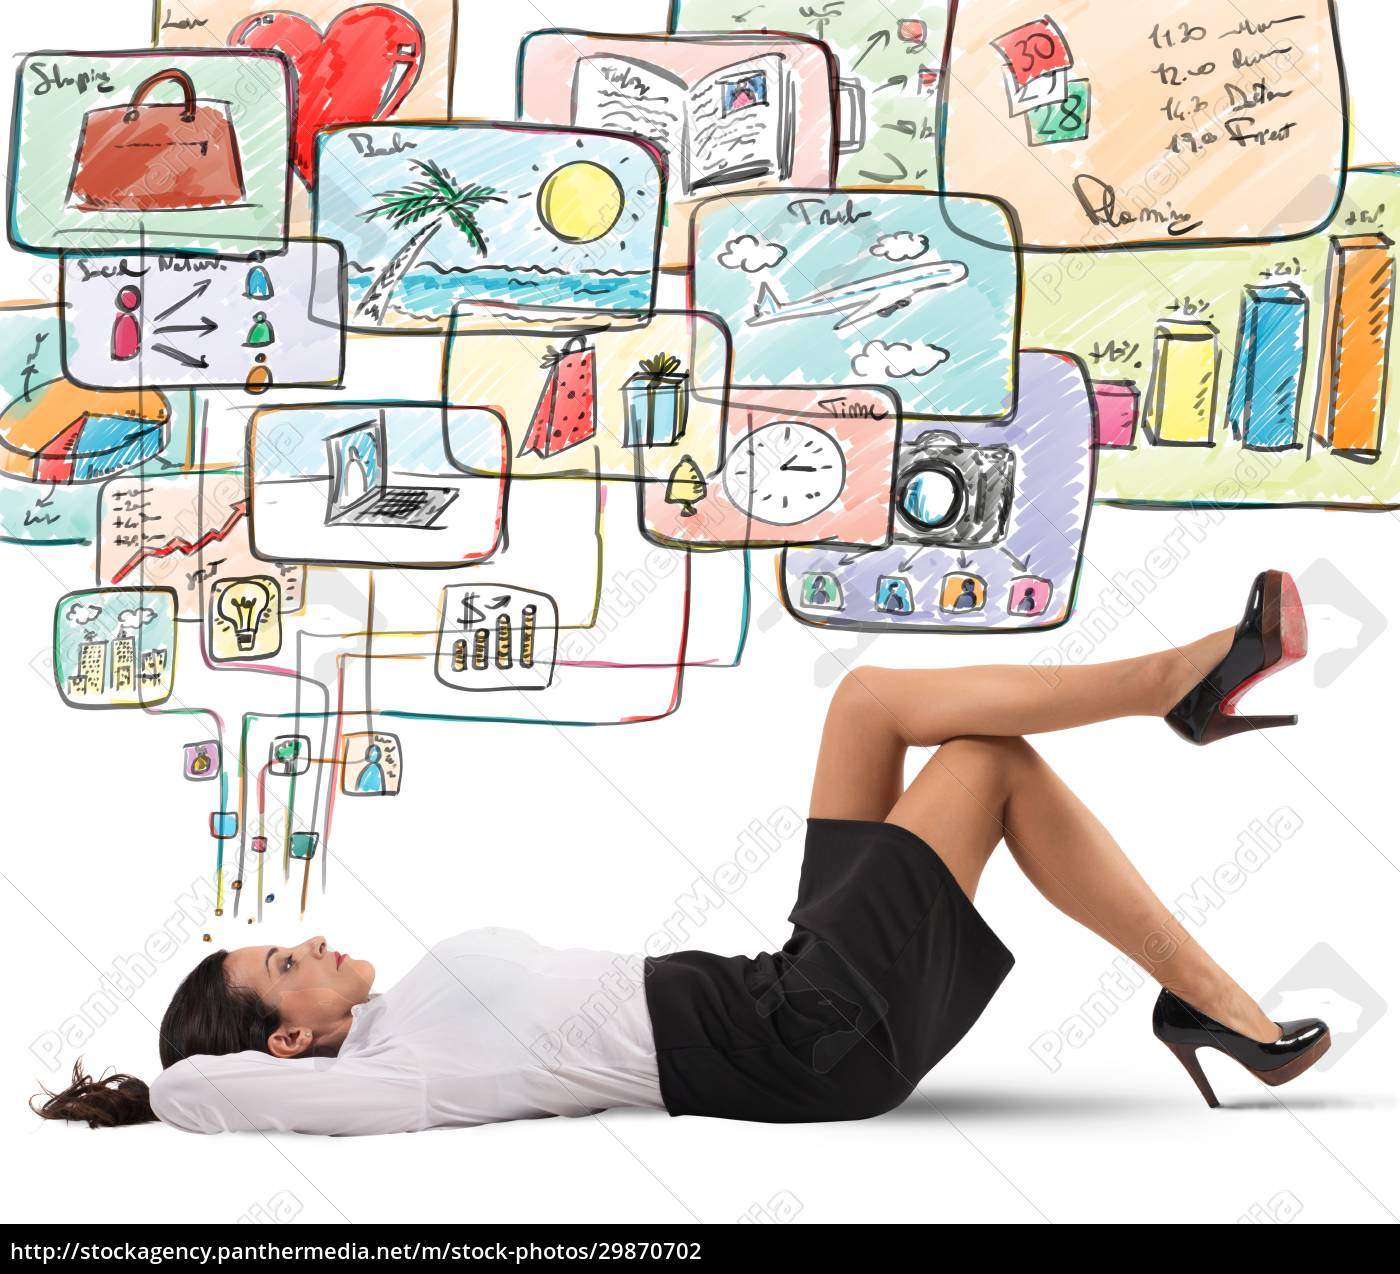 think, of, life, organization - 29870702